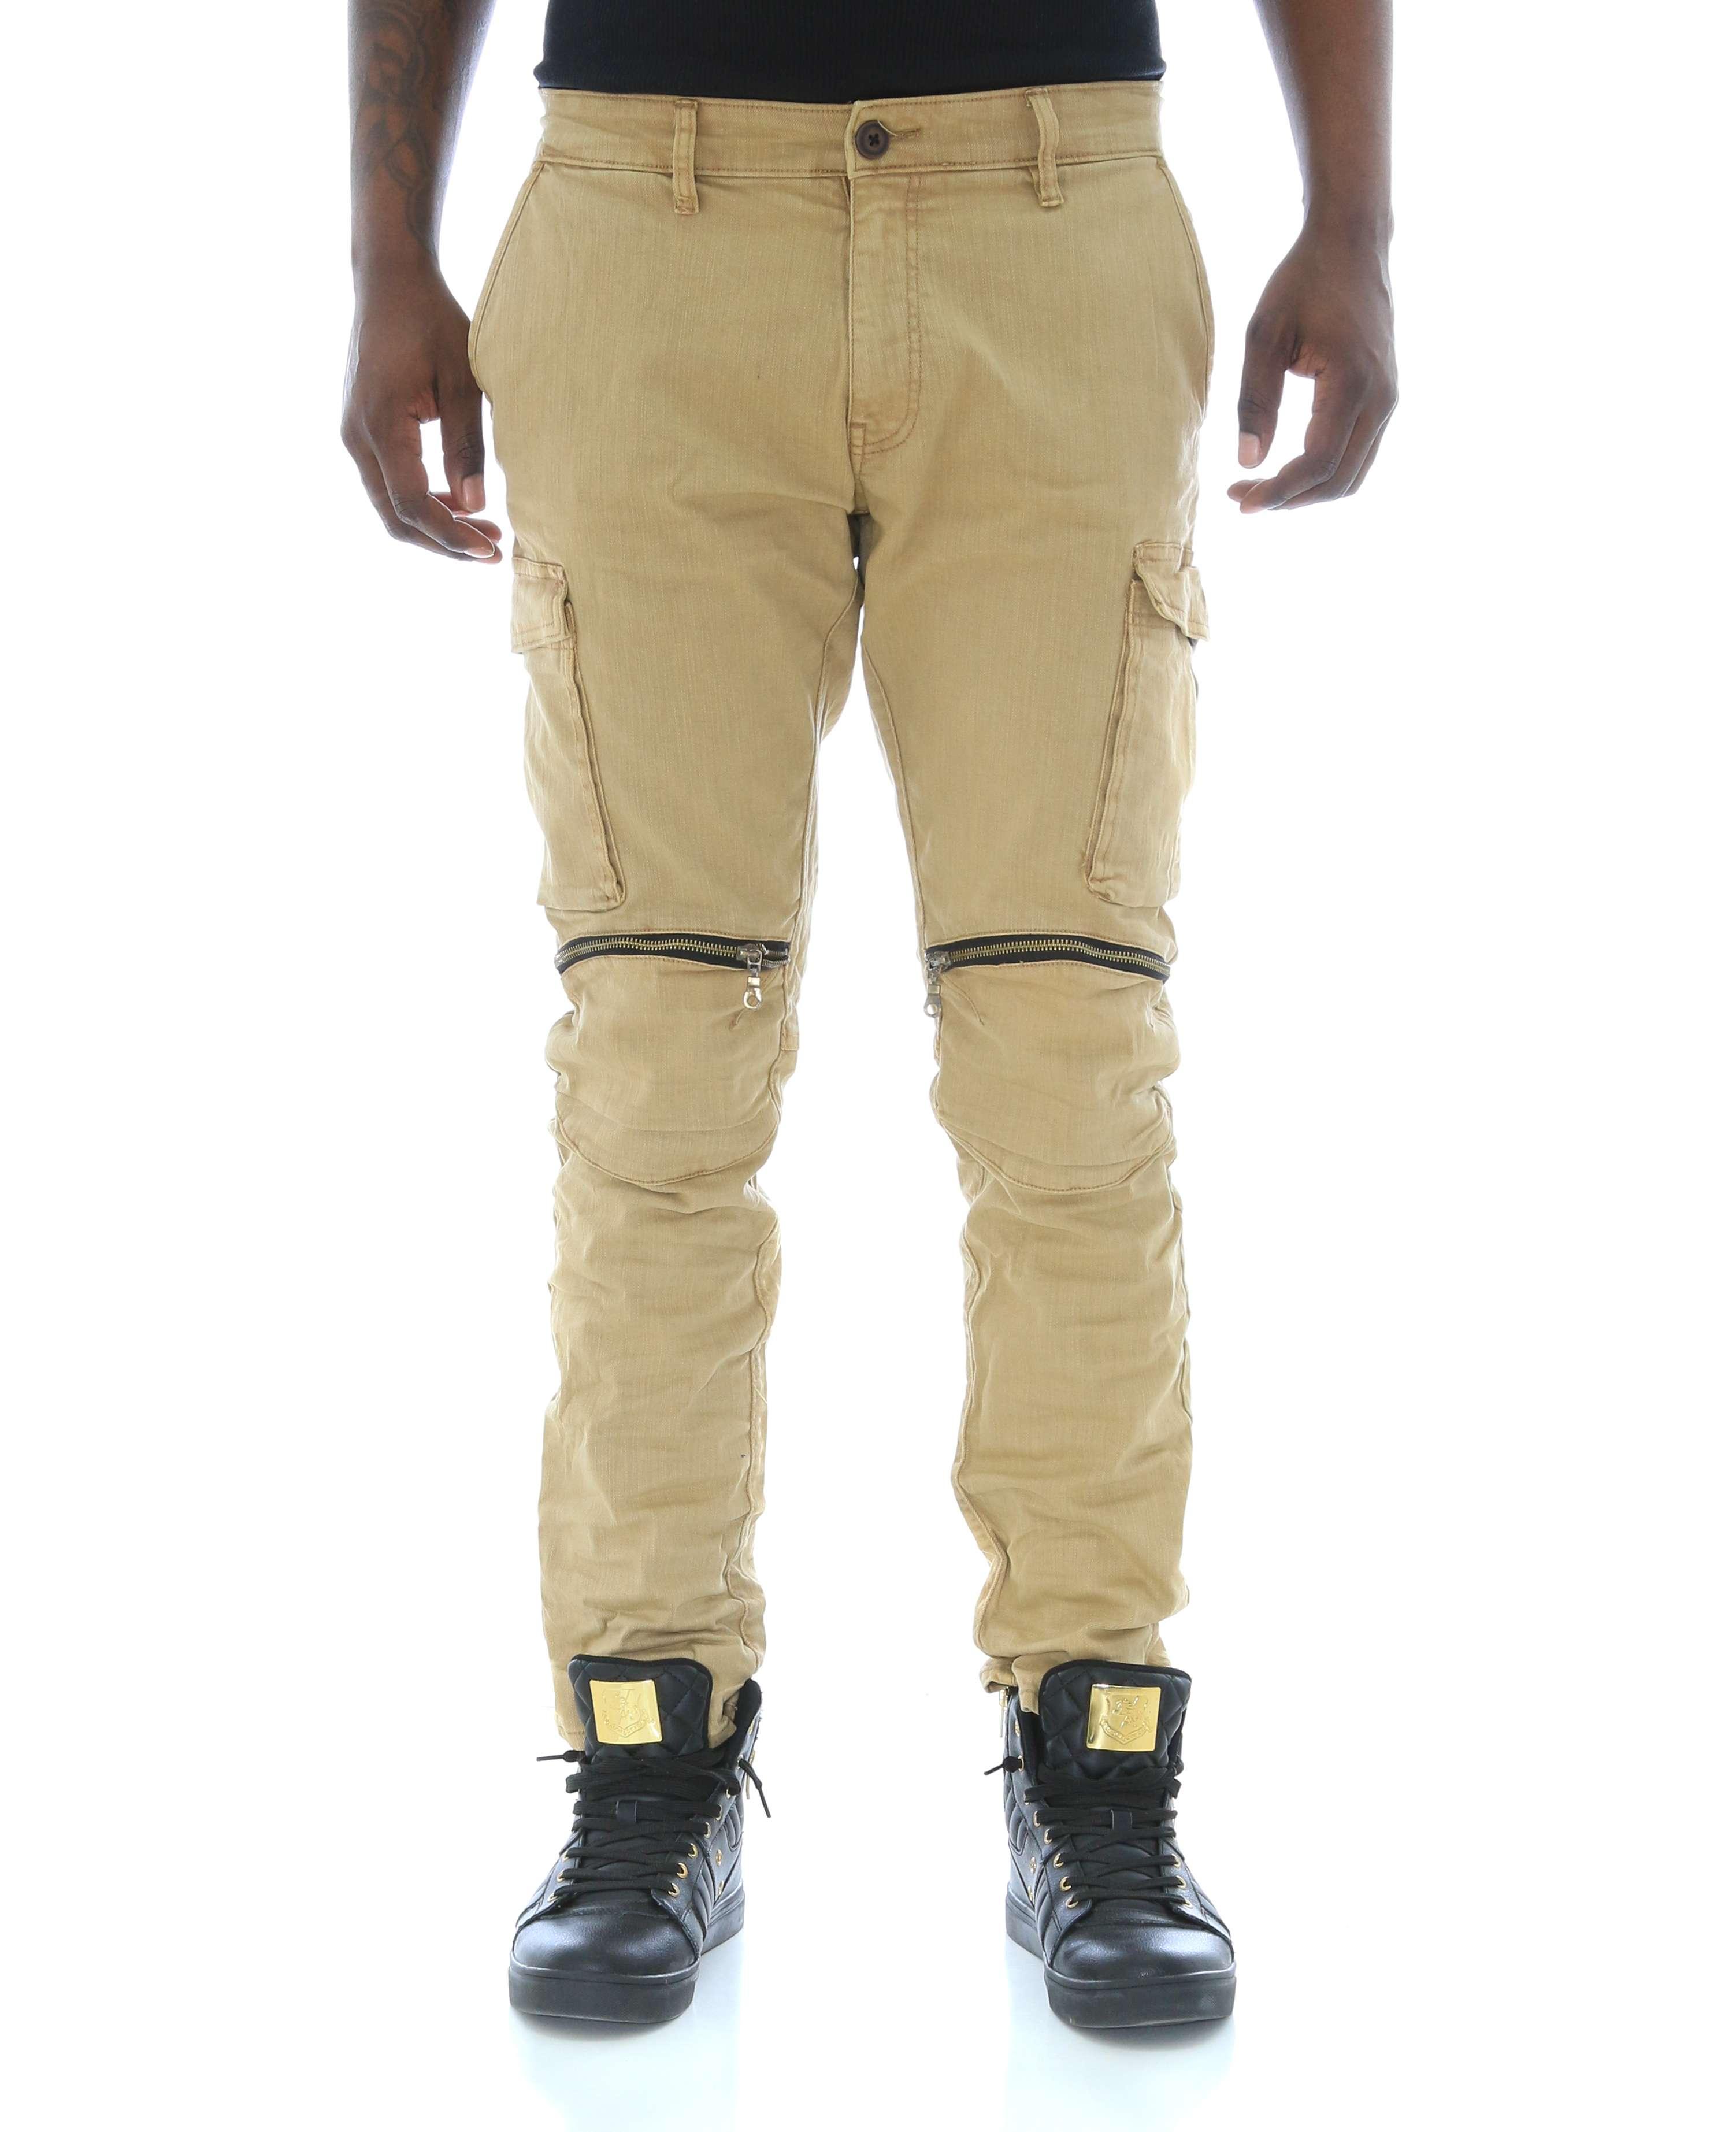 a91326036c96da Jordan Craig Men s Twill Tapered Leg Zipper Knee Cargo Pants